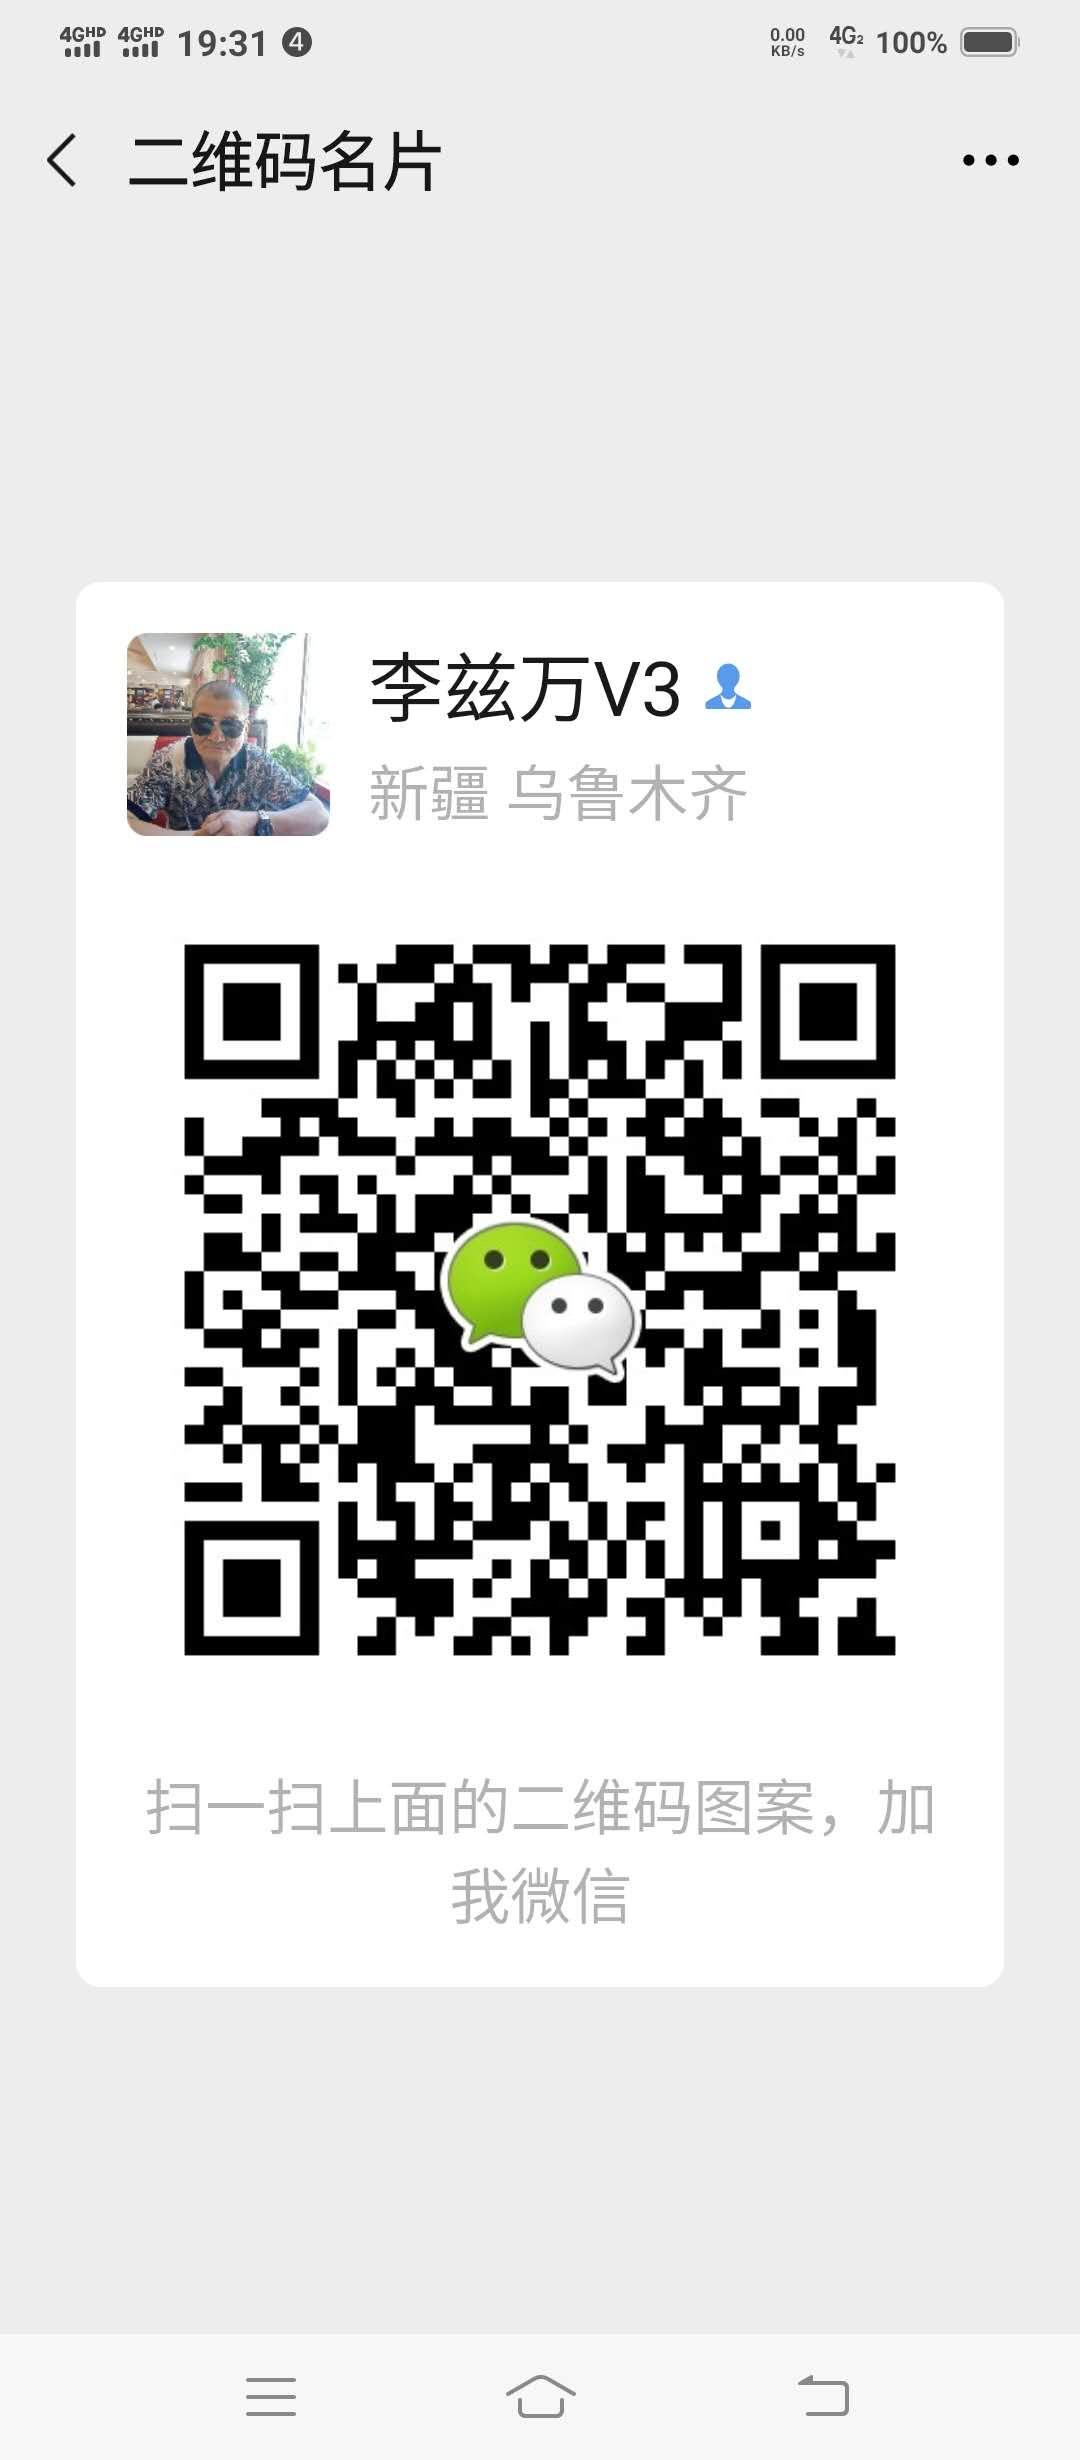 .\..\..\..\..\..\..\AppData\Local\Temp\WeChat Files\b7c6ee965c7a69bcd482a7485d280765_.jpg